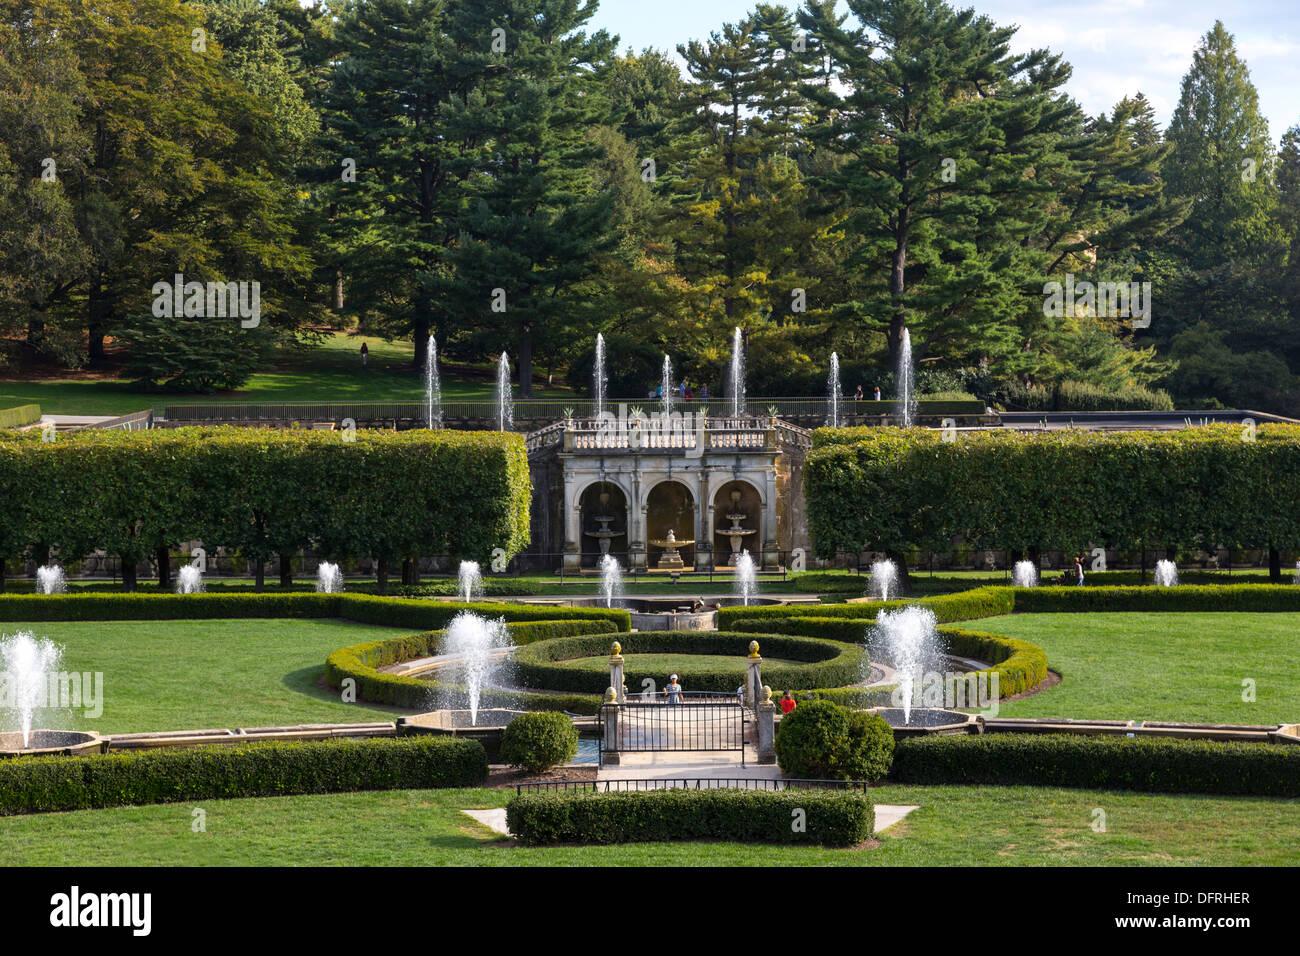 Main Fountain Garden, Longwood Gardens, Kennett Square, Pennsylvania, USA